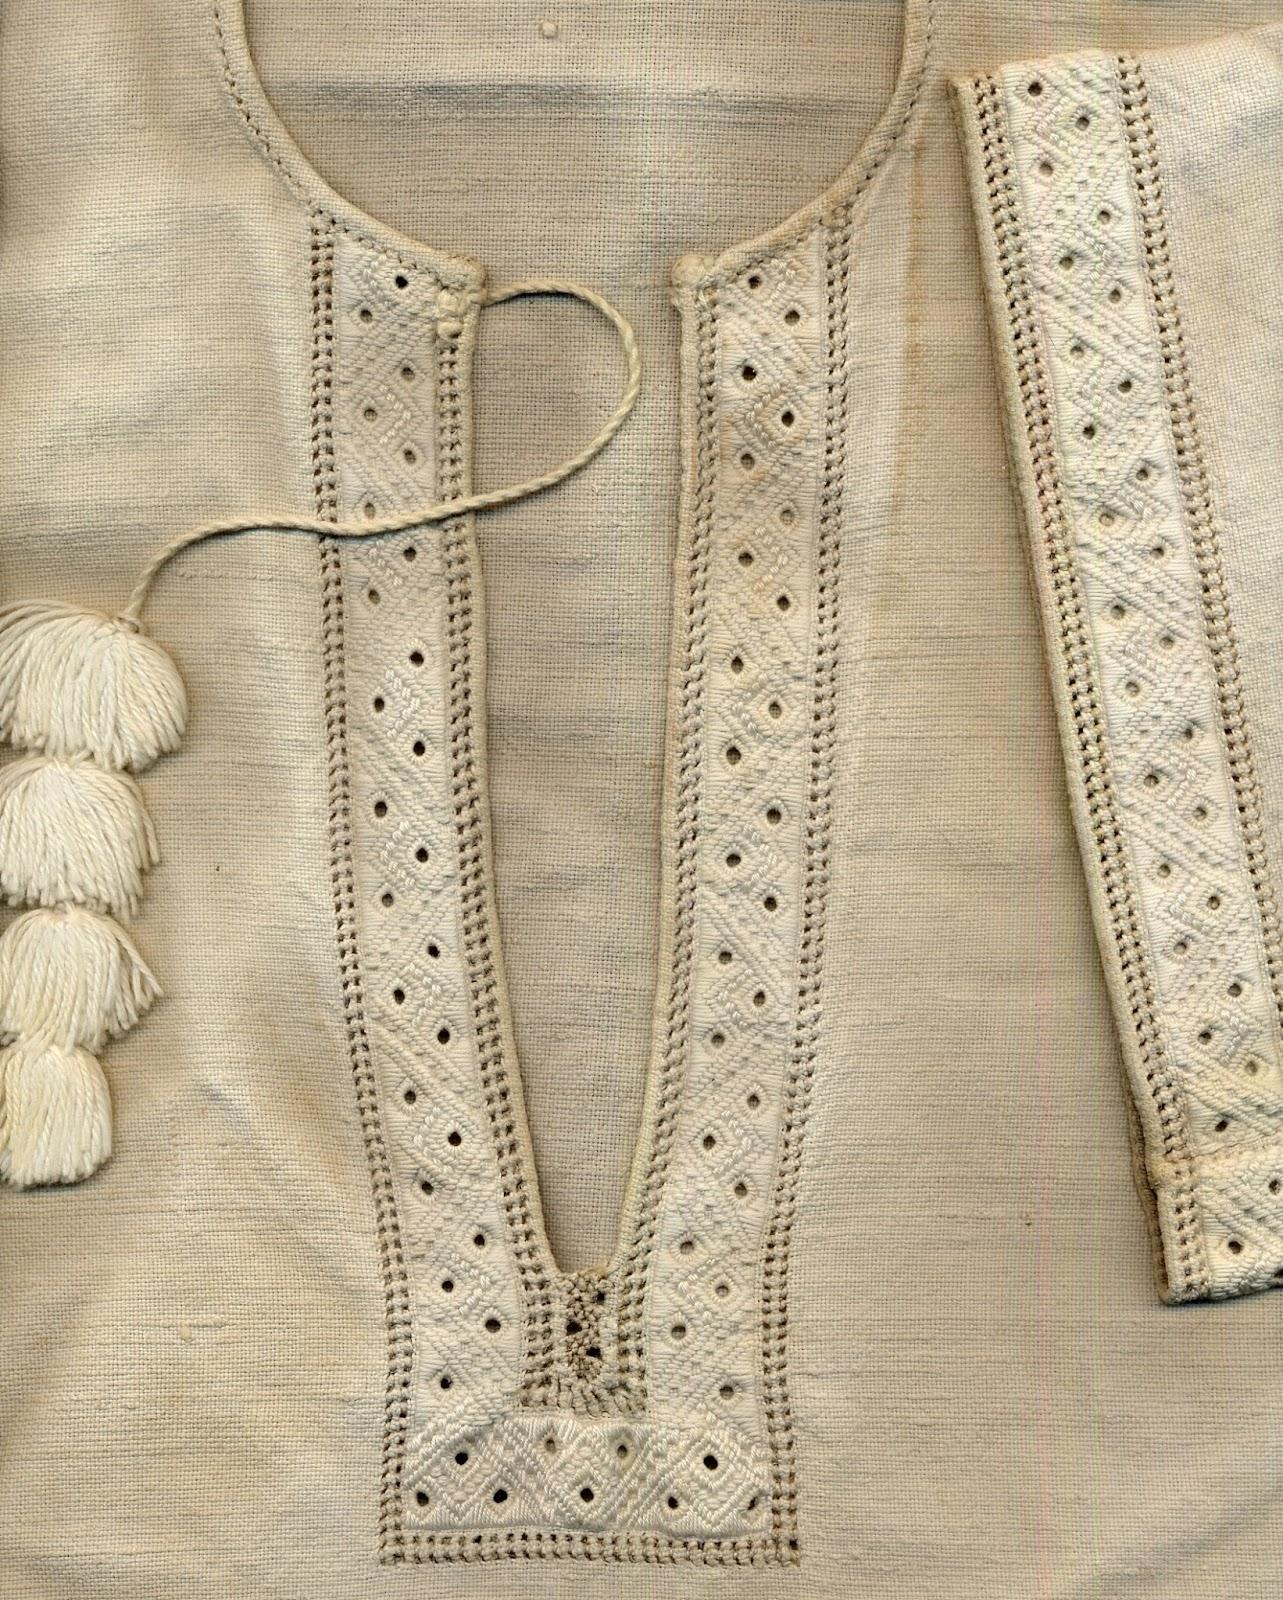 Folkcostume embroidery whitework of sniatyn